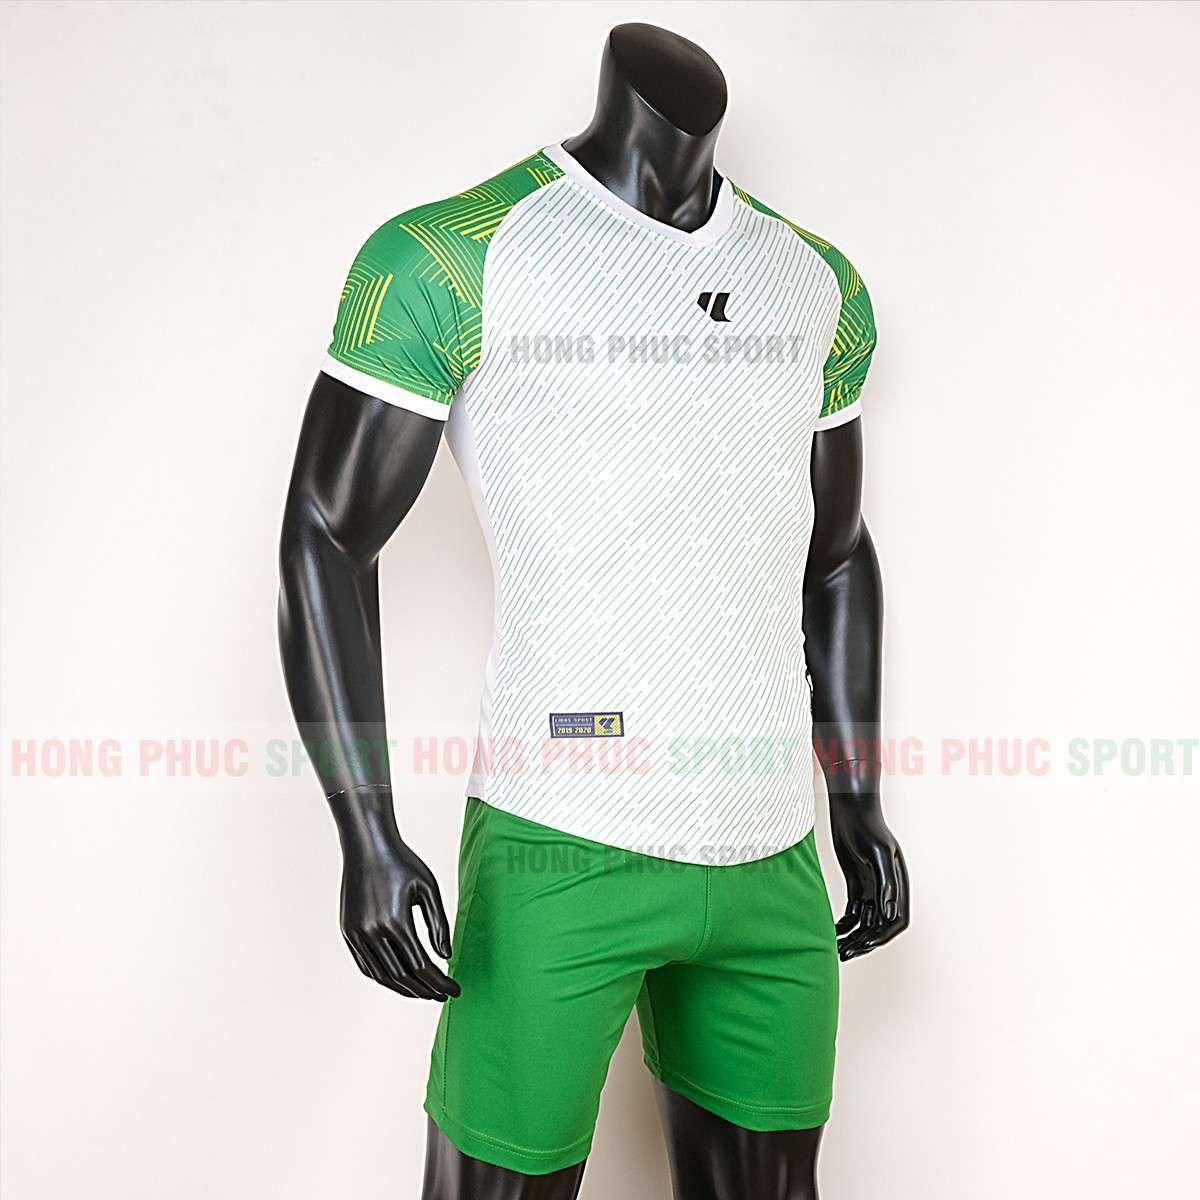 https://cdn.hongphucsport.com/unsafe/cdn.hongphucsport.com/dothethao.net.vn/wp-content/uploads/2020/02/ao-bong-da-khong-logo-lidas-wariors-trang-xanh-la-3.jpg